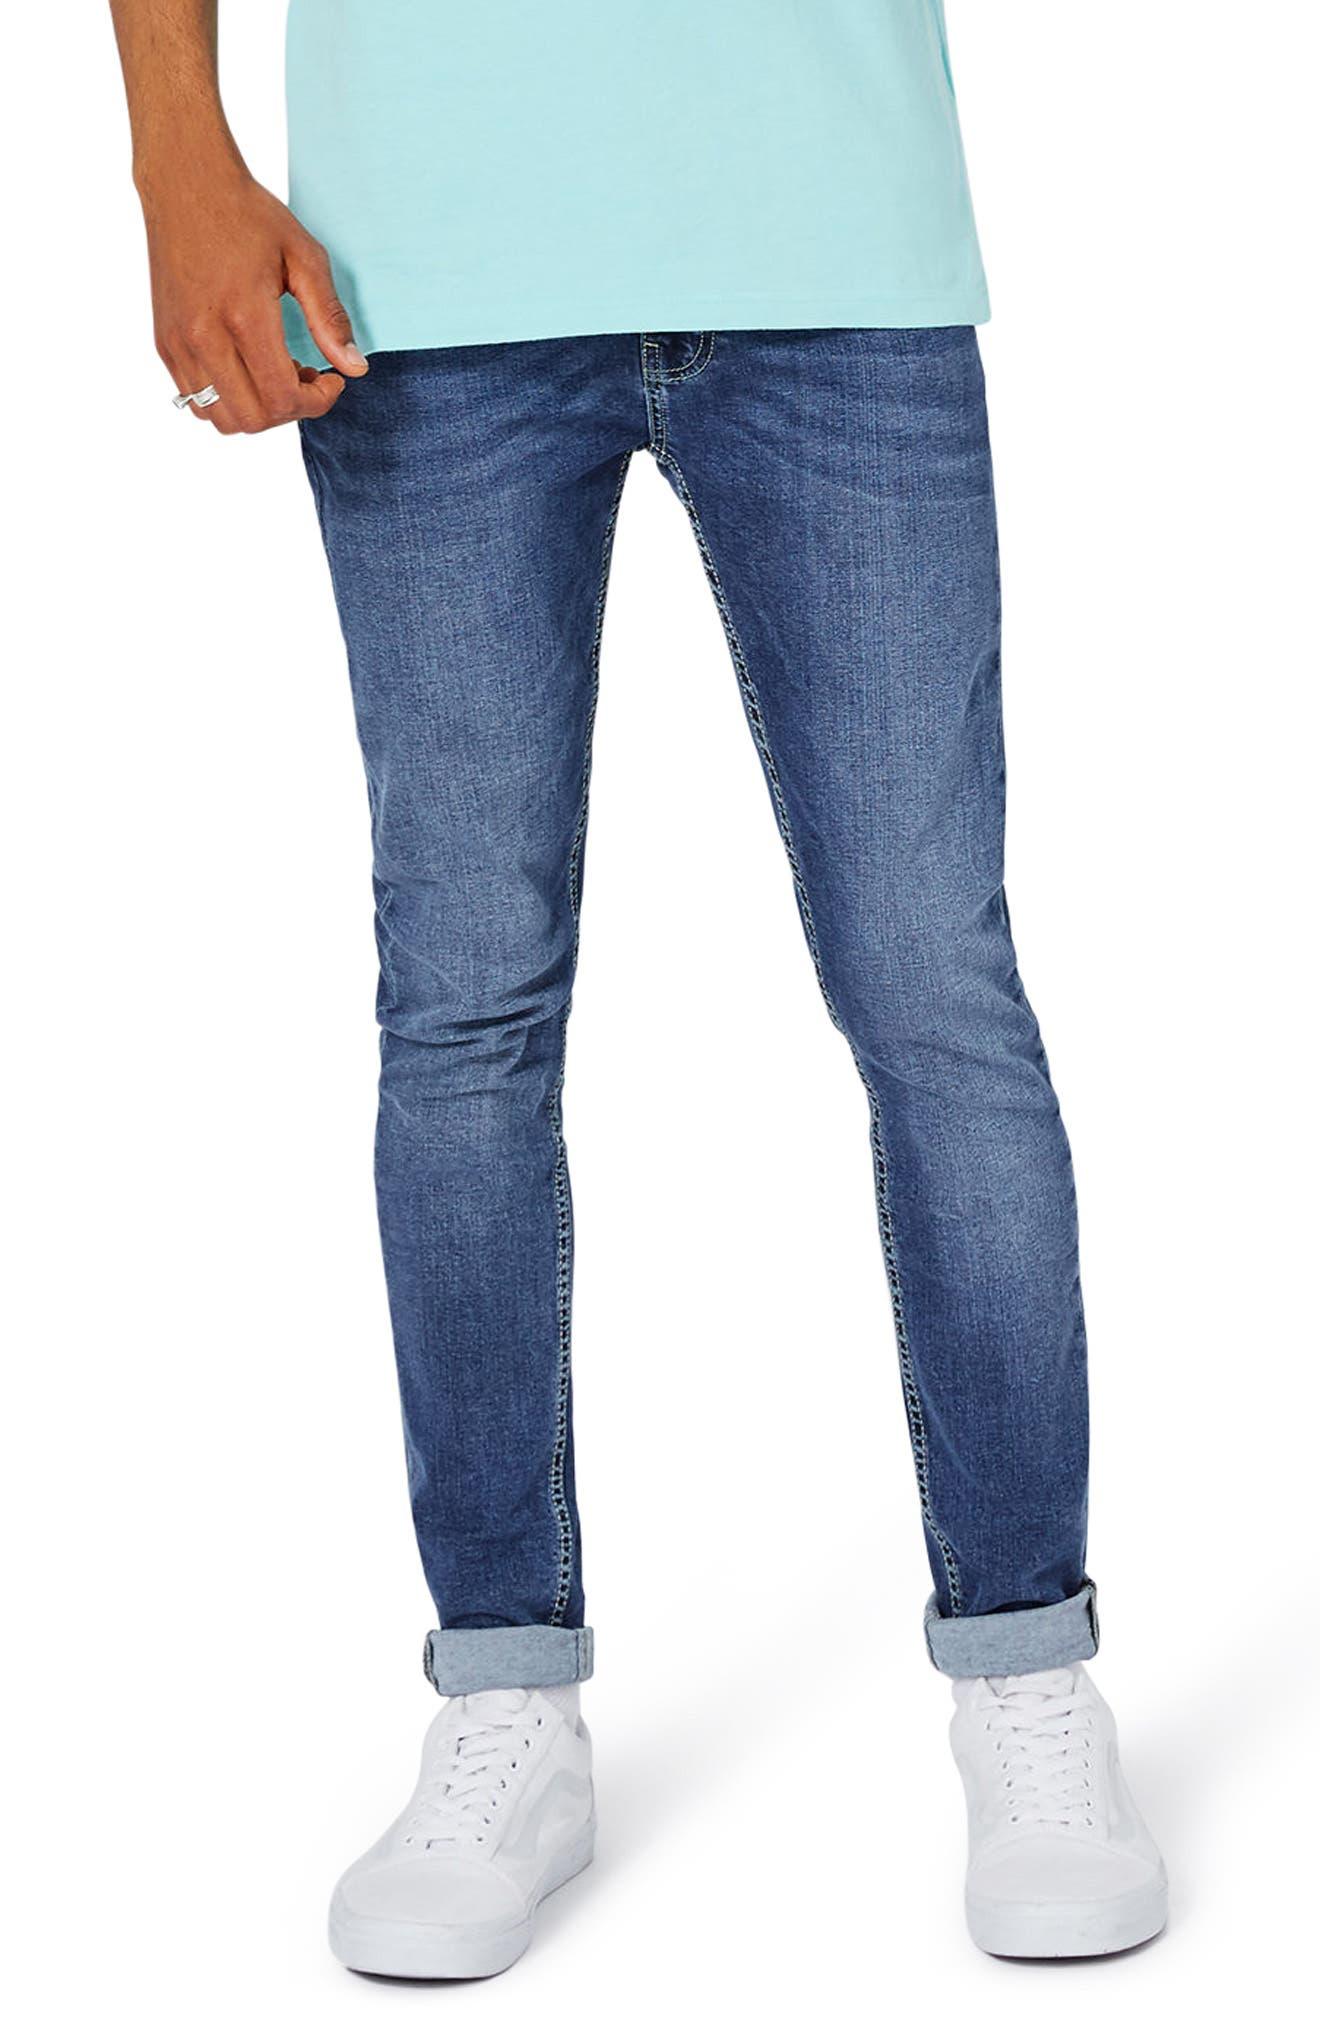 Alternate Image 1 Selected - Topman Spray-On Skinny Fit Jeans